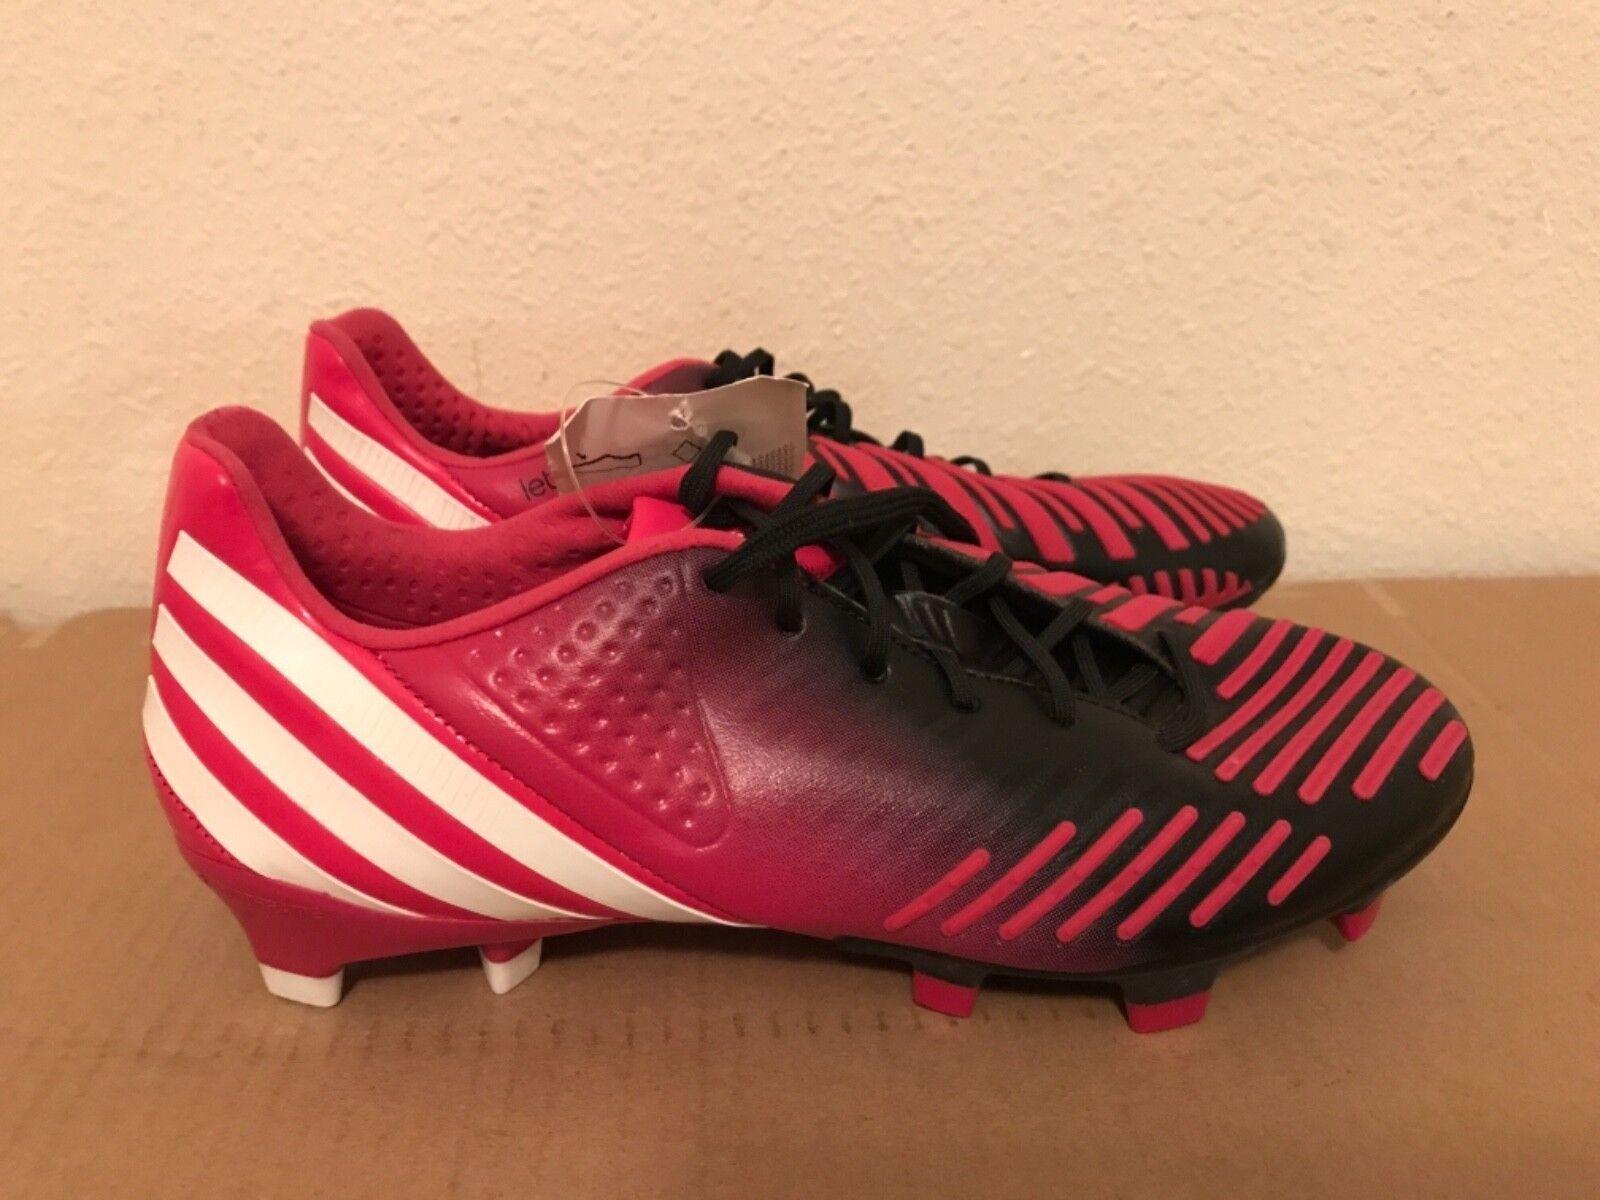 590692b1c3a Adidas Adidas Adidas Women s Predator LZ TRX FG G60124 Soccer Cleats Size  6.5 8d3ac8